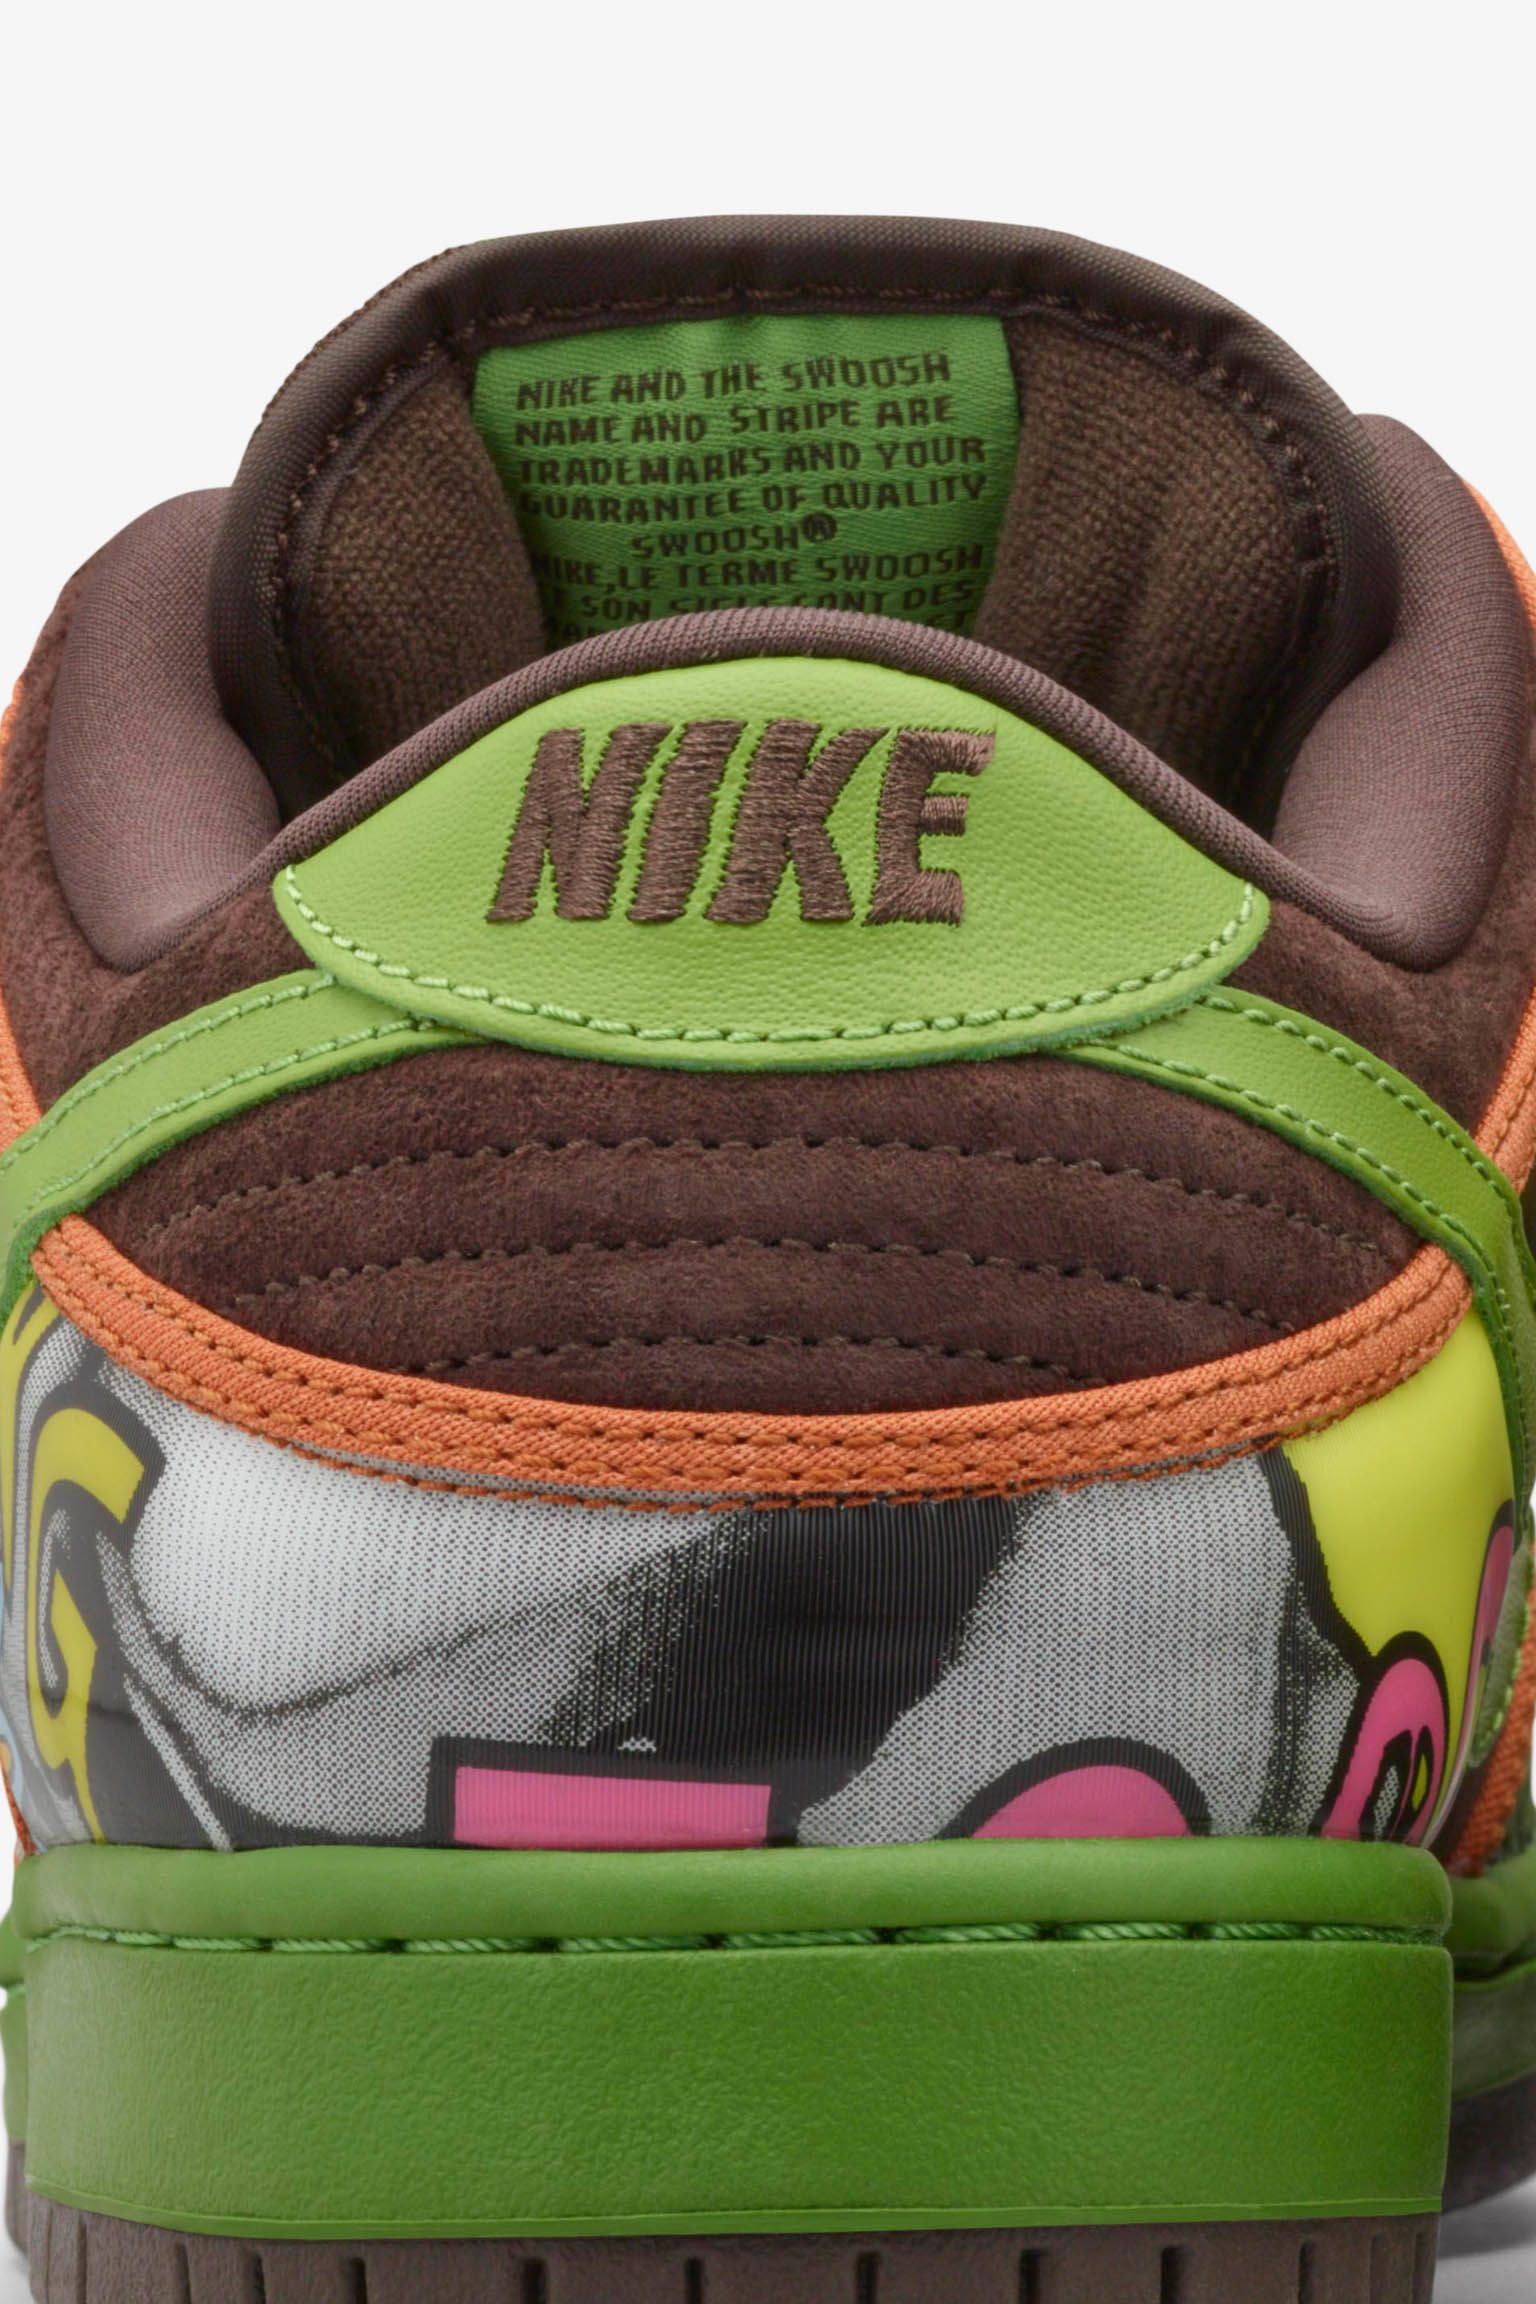 Nike Dunk Low SB 'De La Soul'